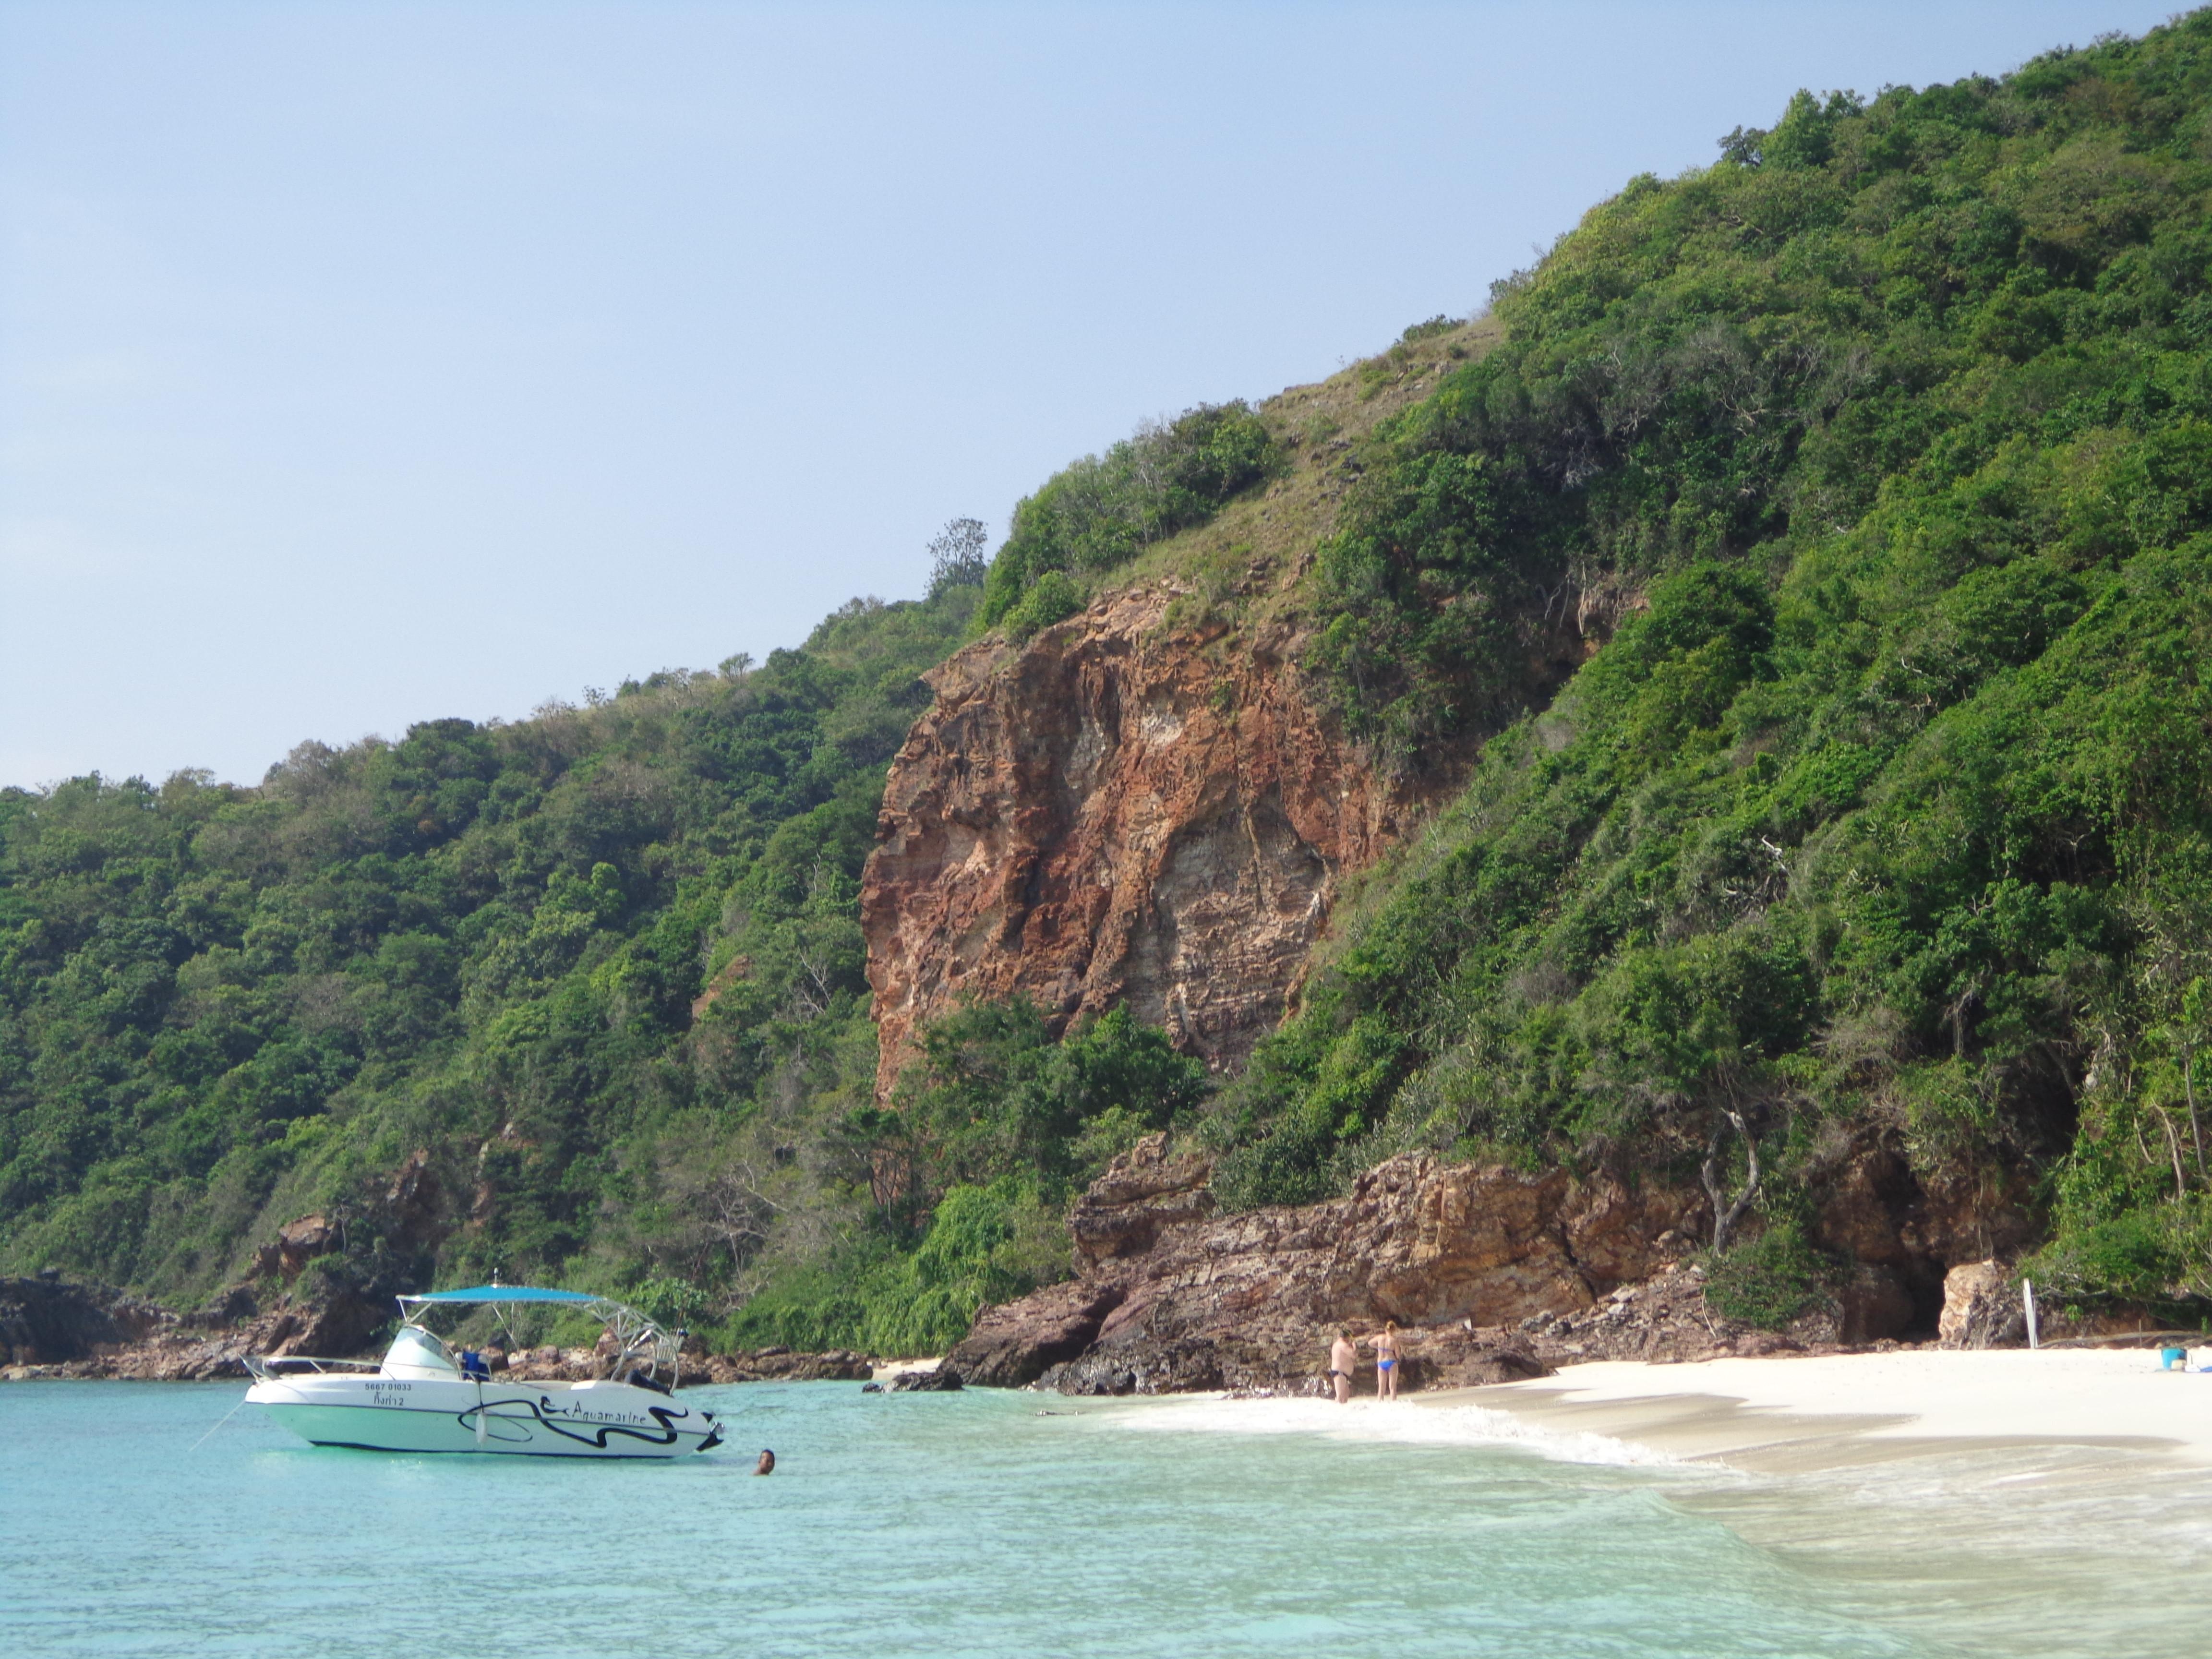 PACKAGE #1: Deserted Island